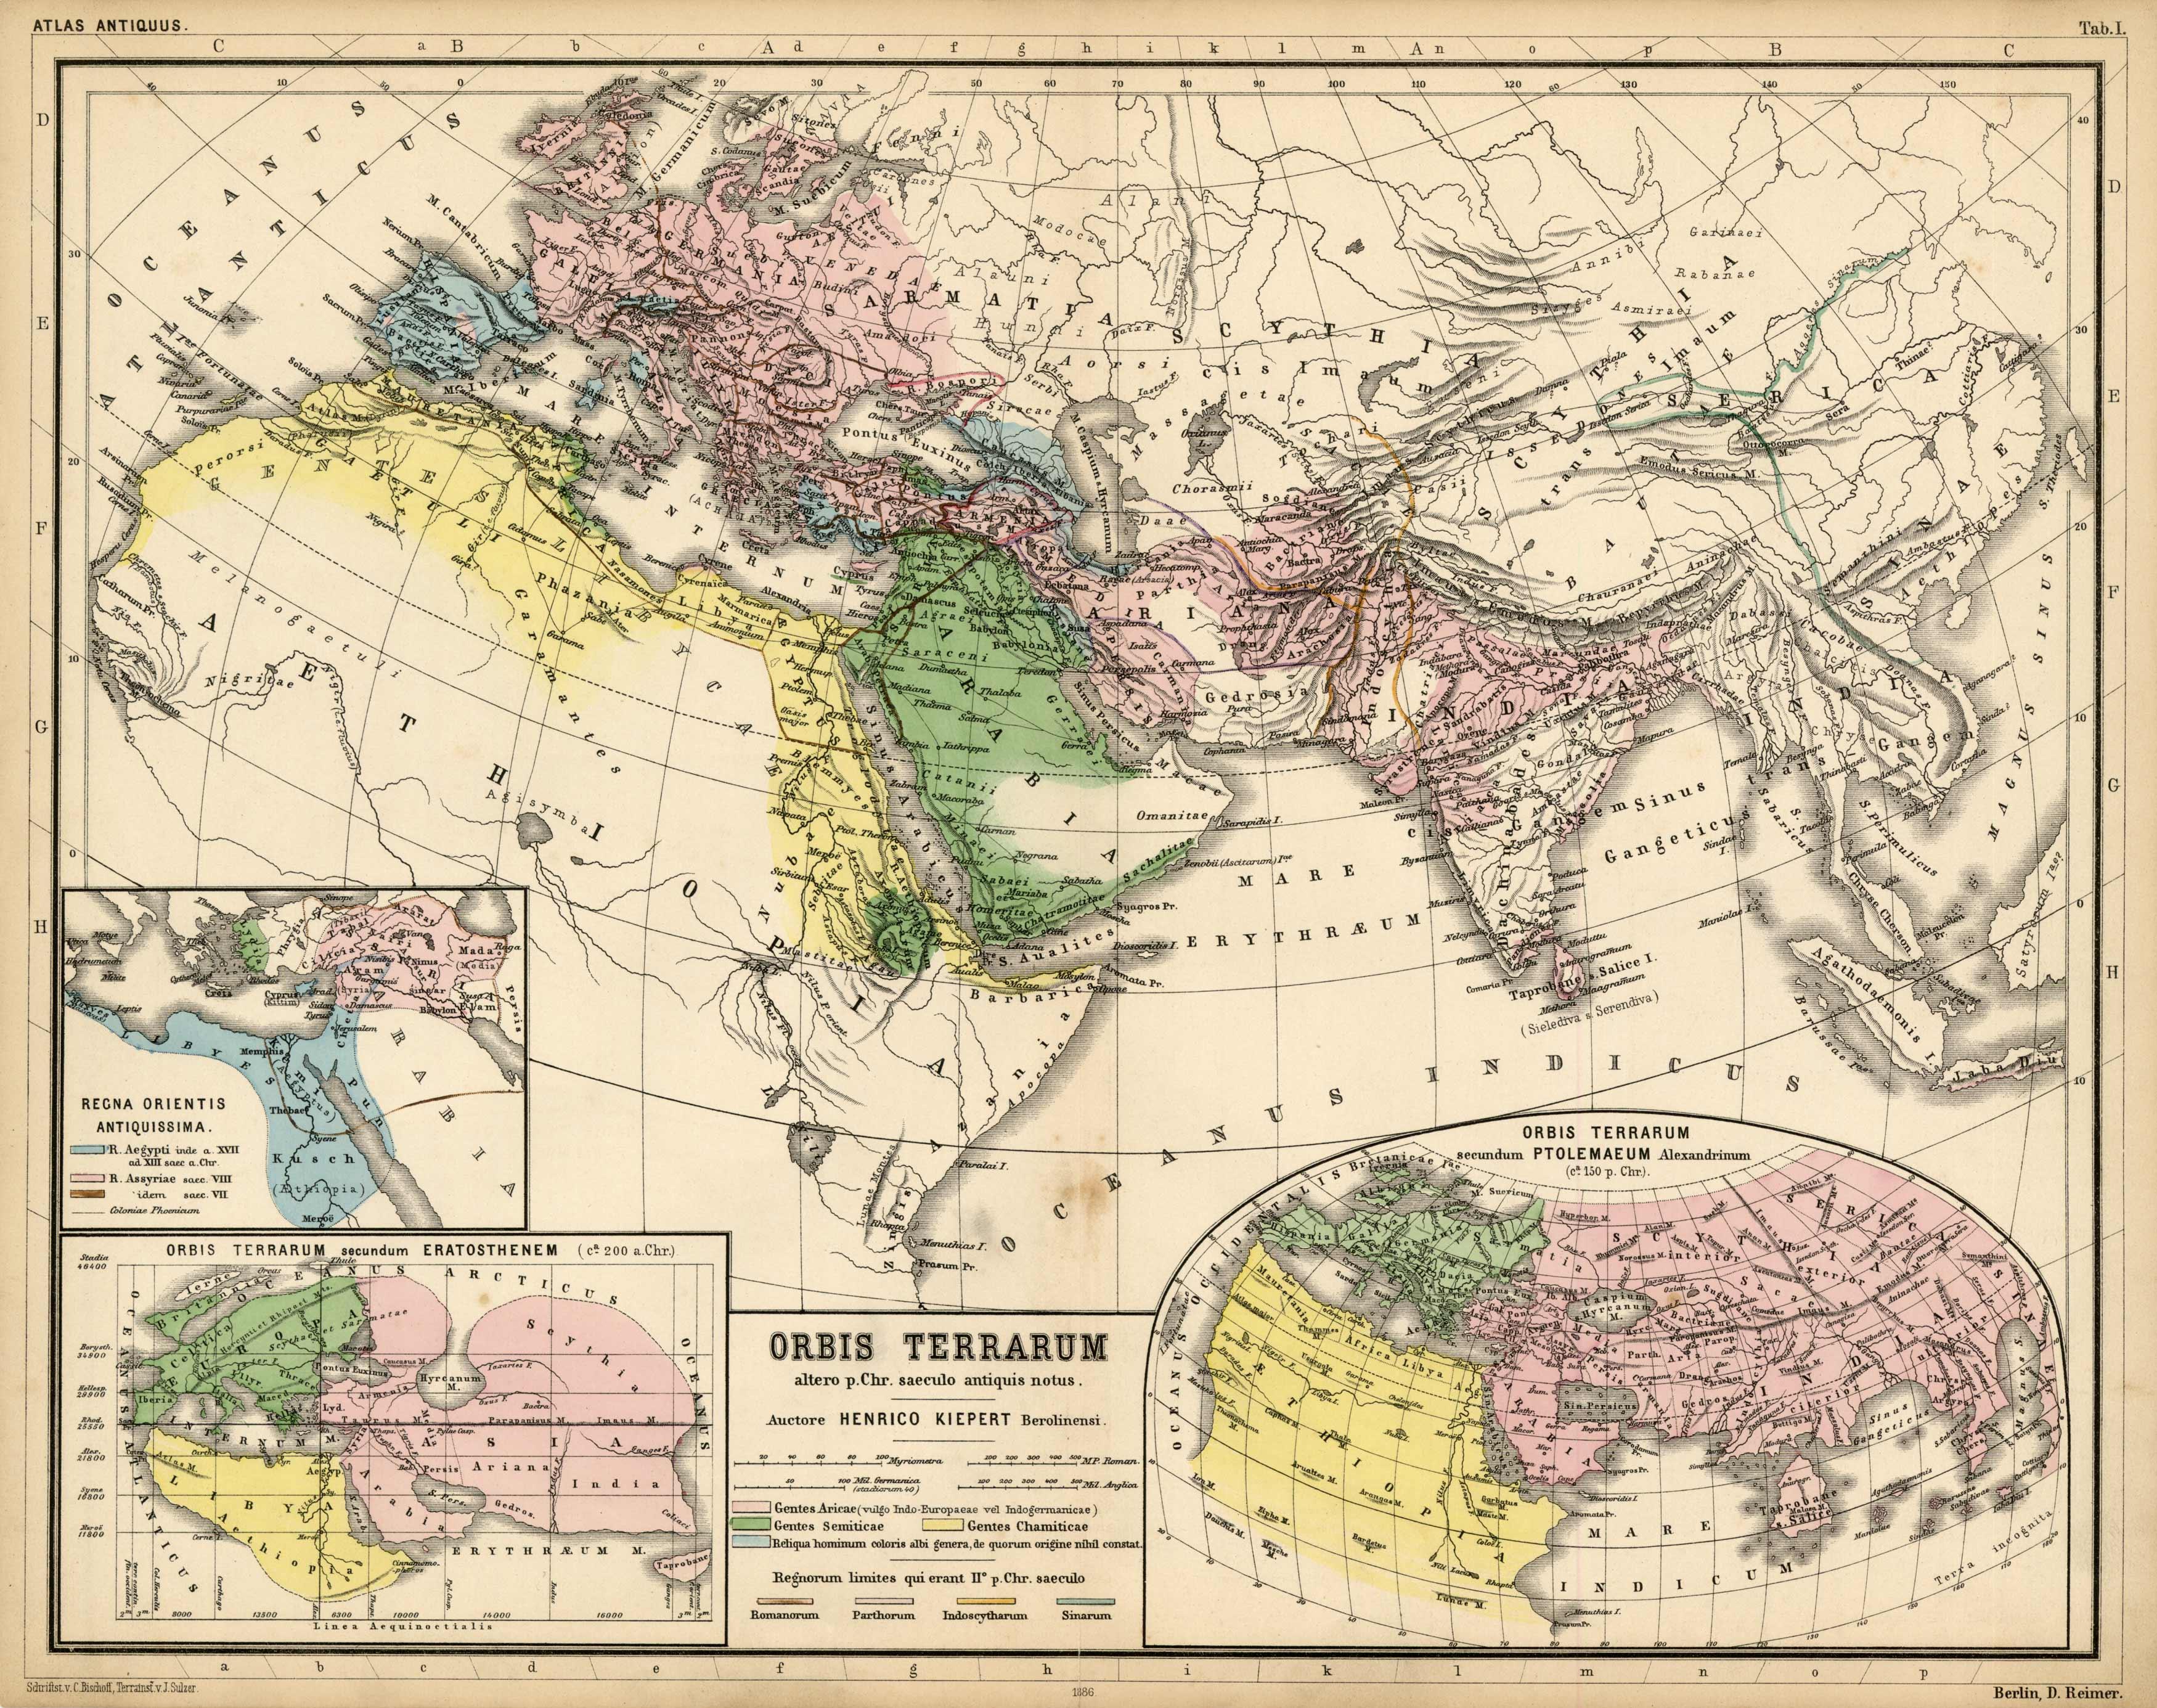 Orbis Terrarum (The World)